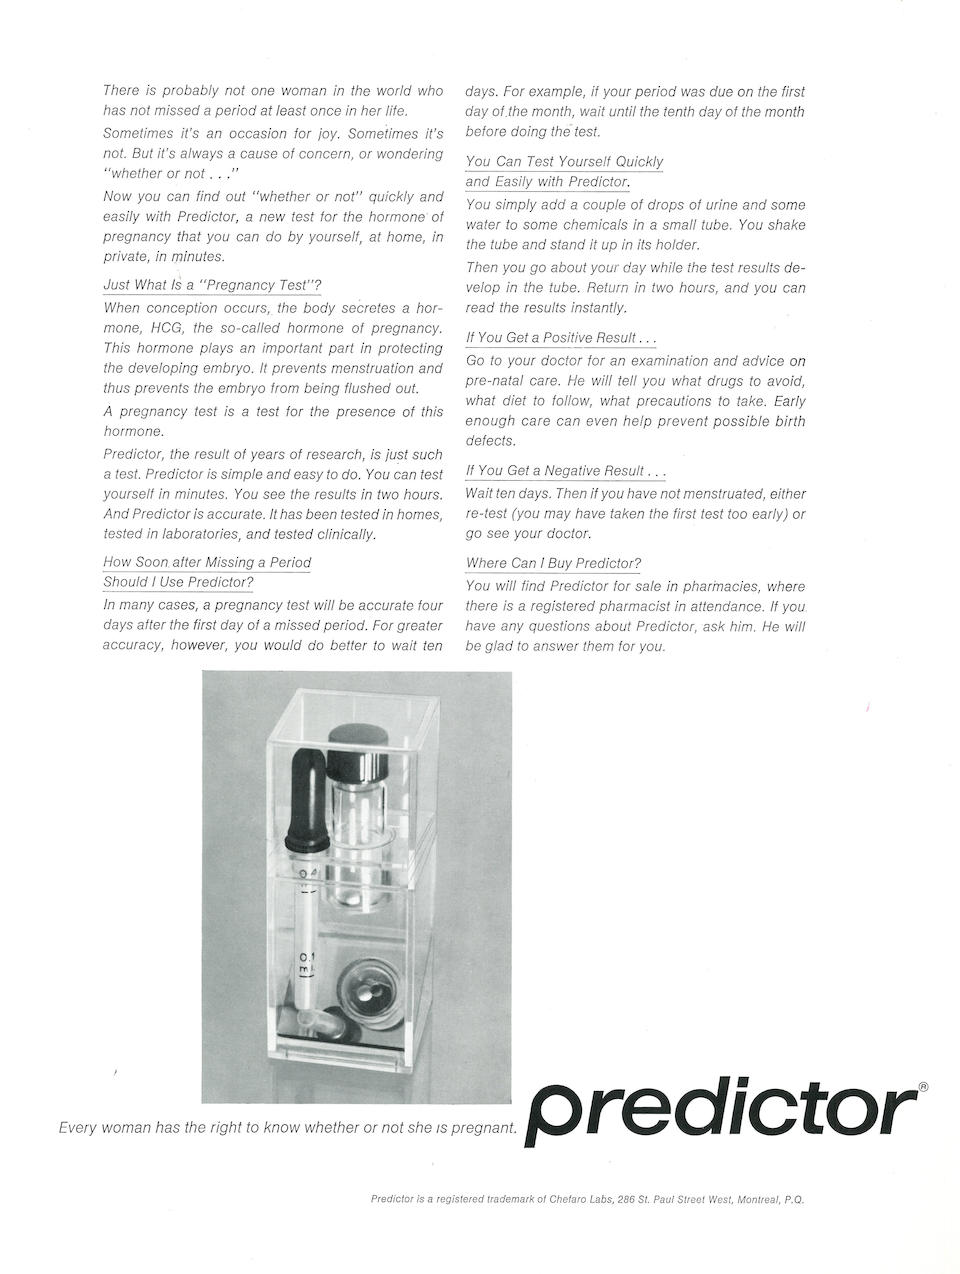 CRANE, MARGARET, INVENTOR—THE FIRST HOME PREGNANCY TEST. Original Predictor home pregnancy test prototype, 1968.